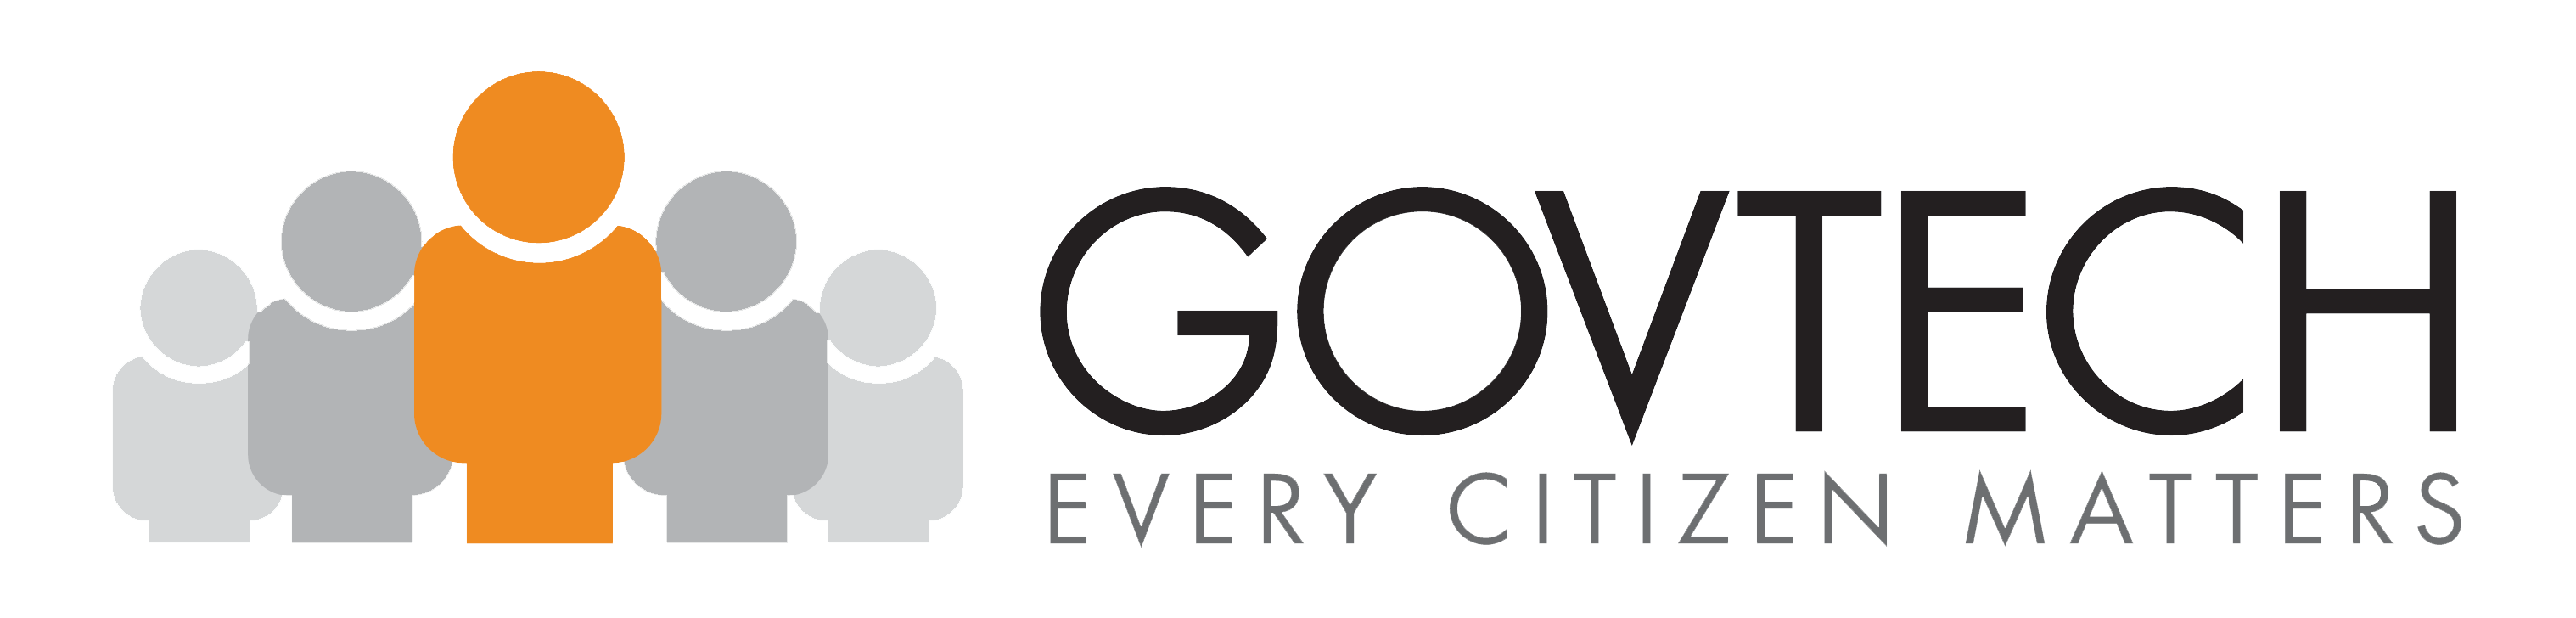 Govtech Solutions logo